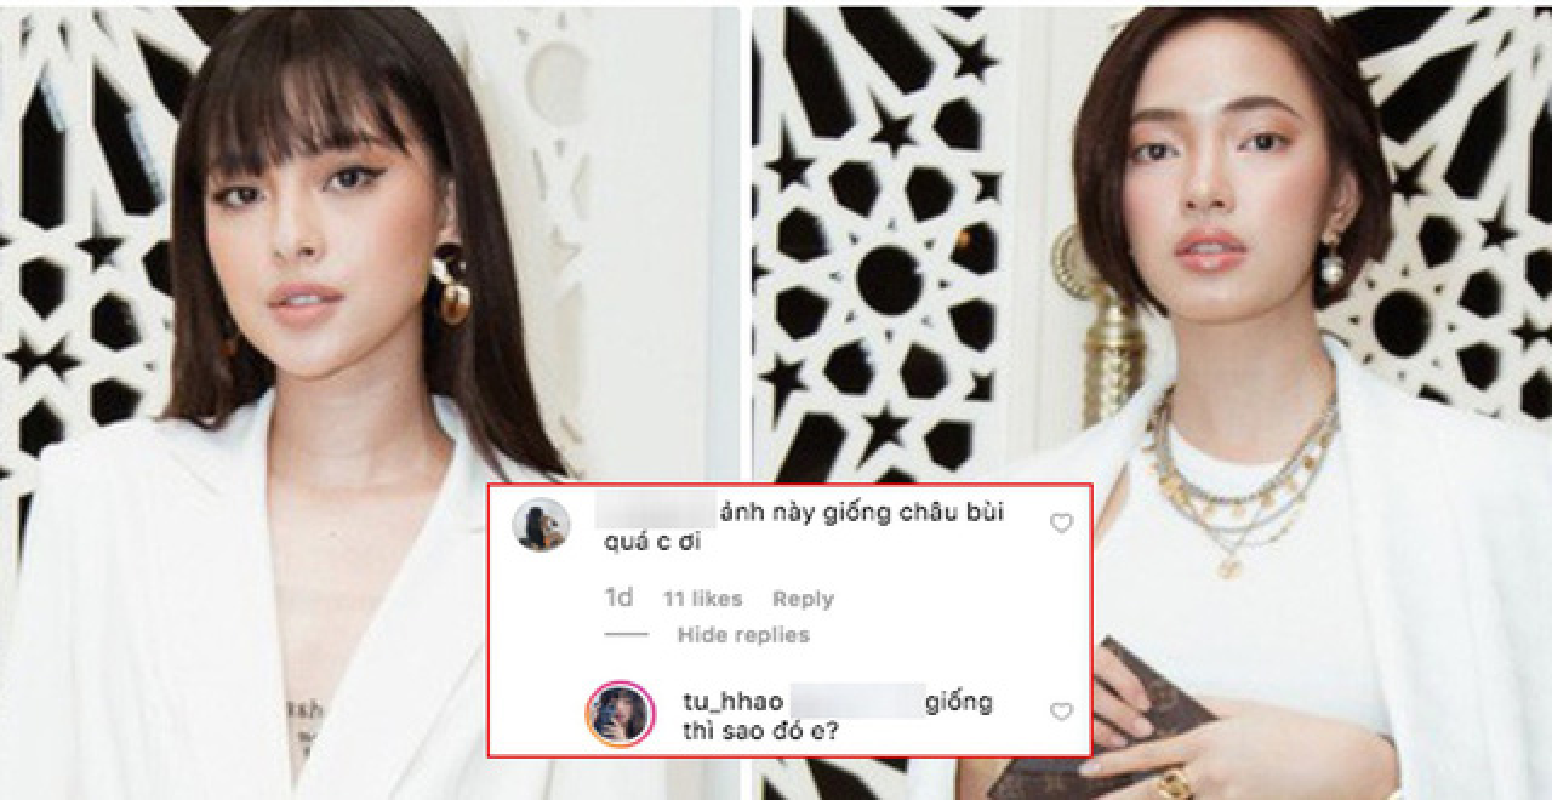 Bang hoang cap hot girl dung canh nhau bi tuong nham chi em sinh doi-Hinh-7